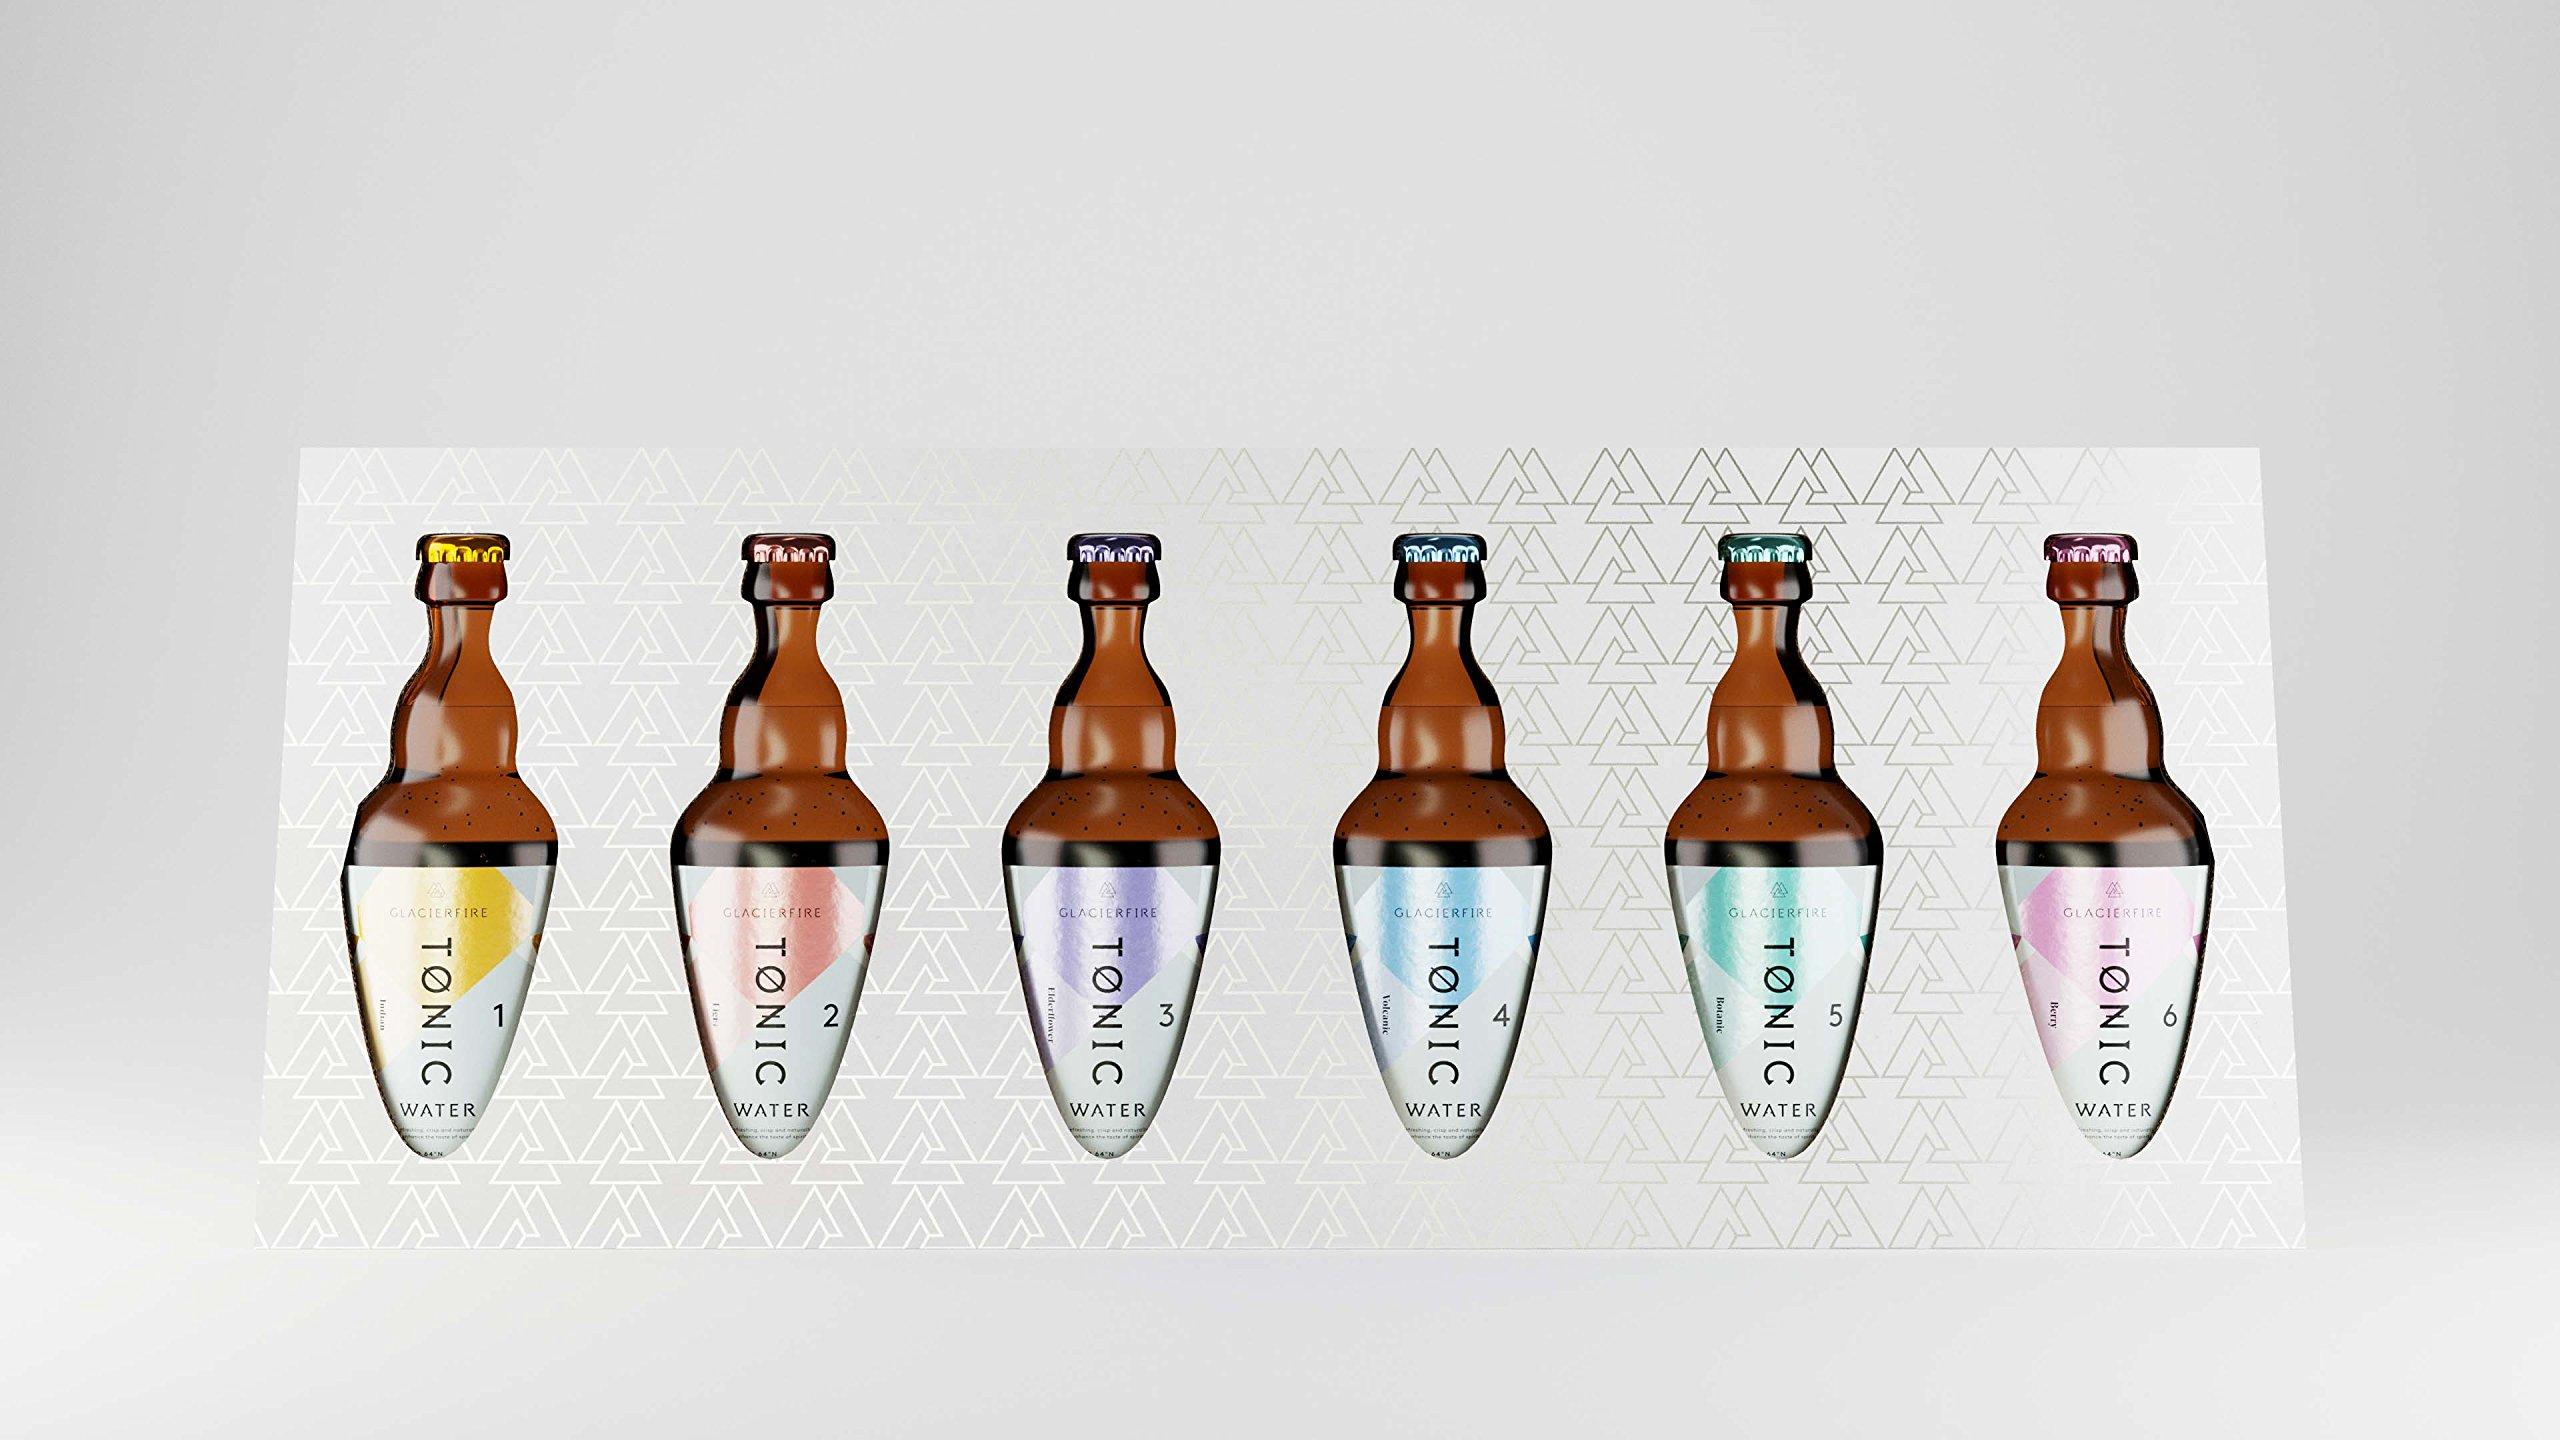 GlacierFire - Icelandic Tonic Water Gift Pack - 6 Flavors x 330ml Glass